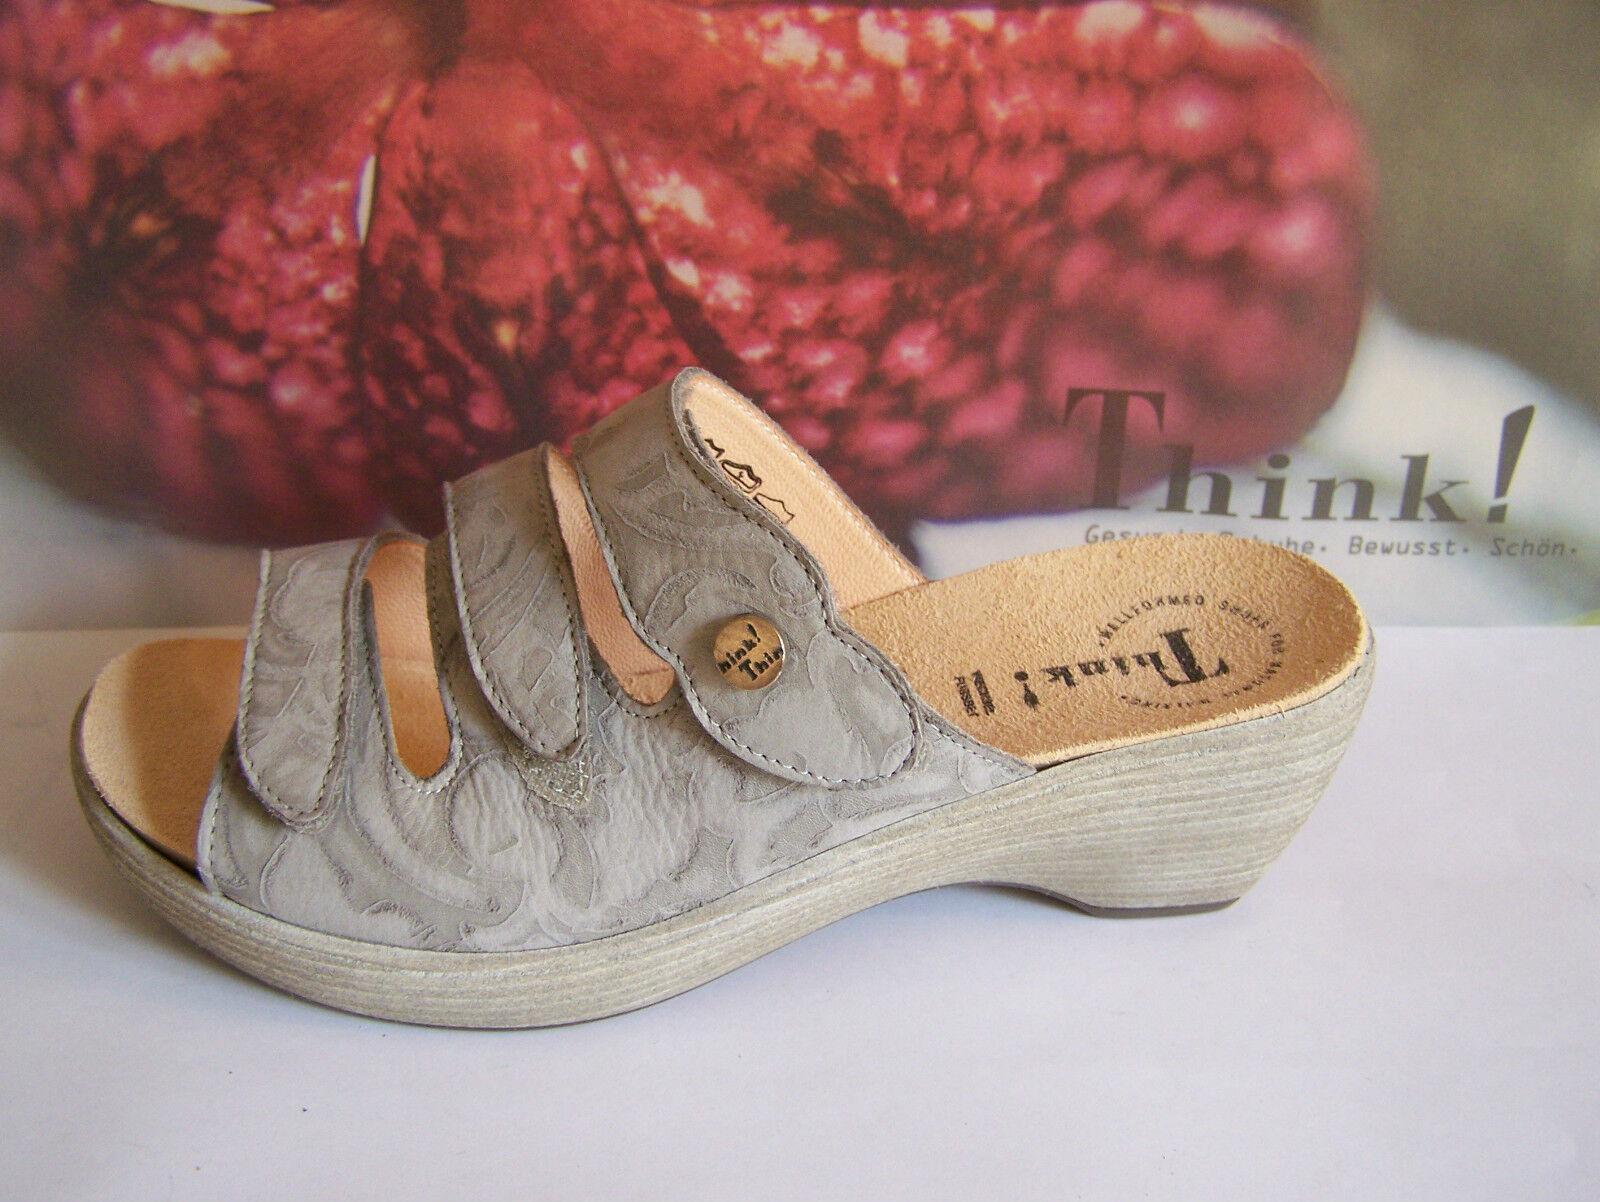 Think  shoes Model Cosima Aluminium Effect Spring Summer + think Bag